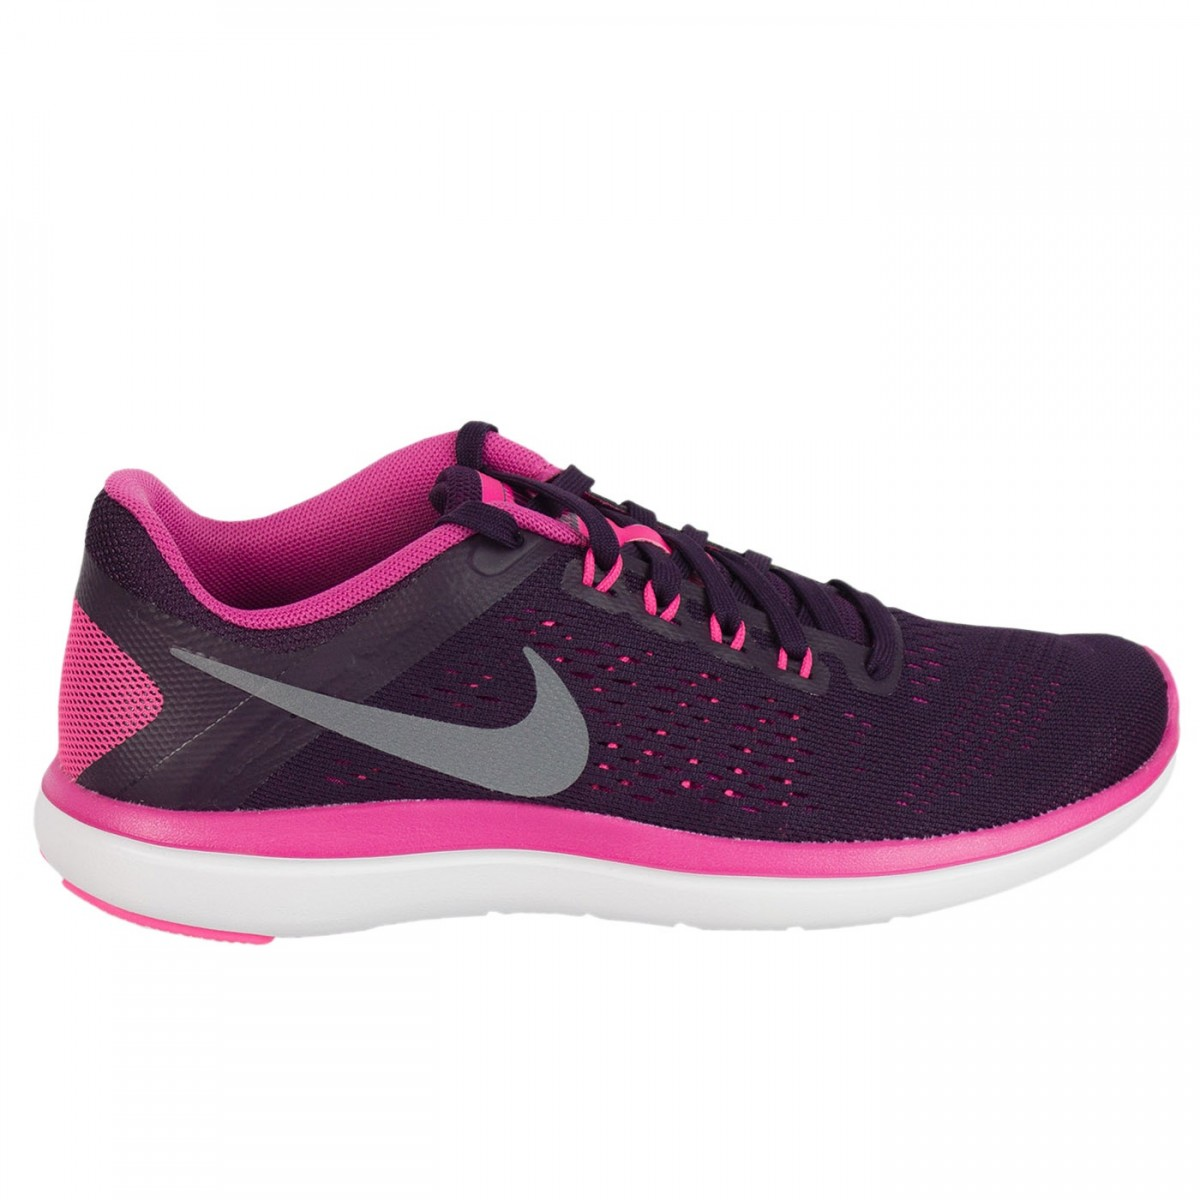 Bizz Store - Tênis Feminino Nike Flex 2016 Corrida Roxo Rosa 166e3445a3